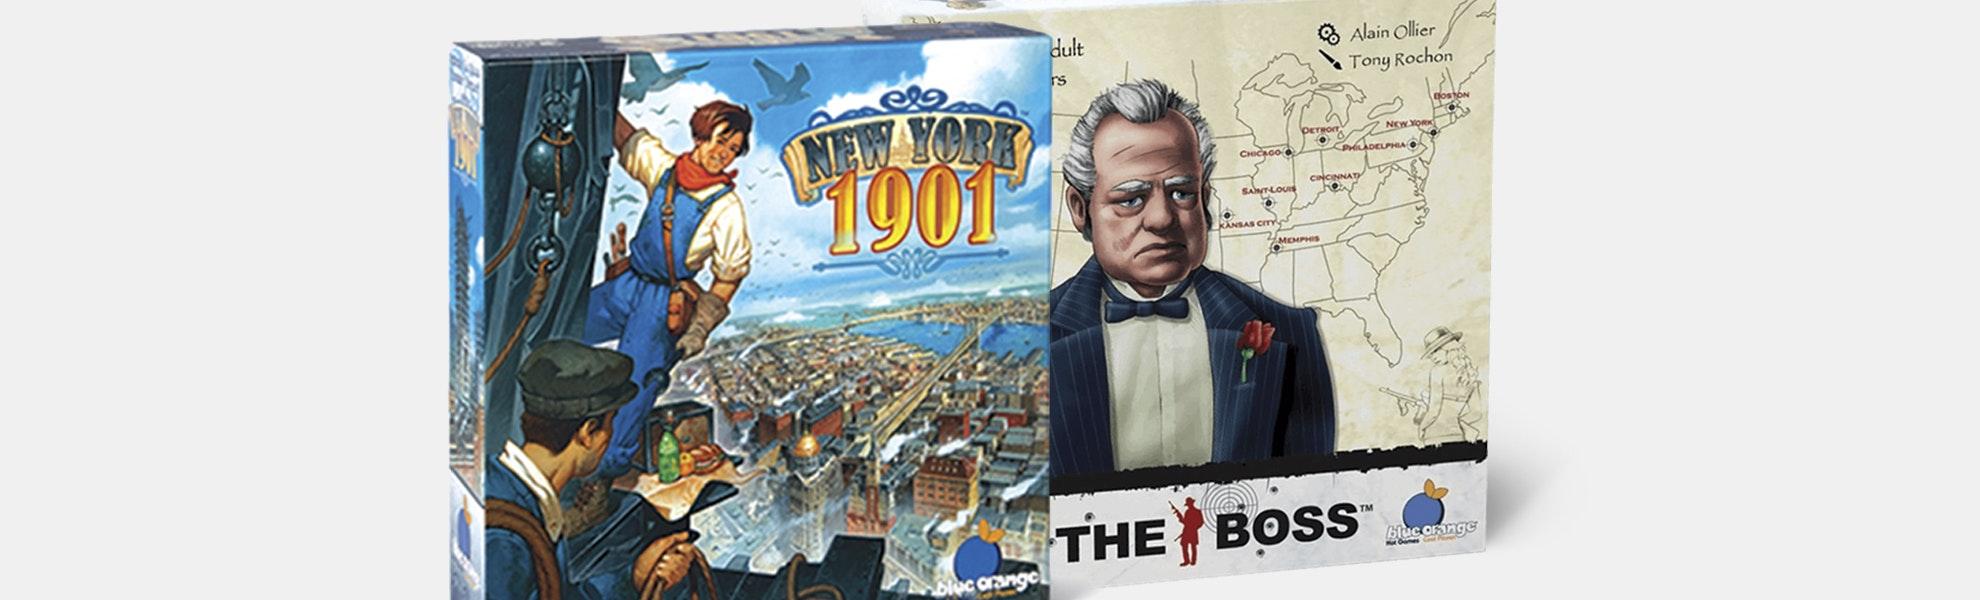 New York 1901 & The Boss Board Game Bundle